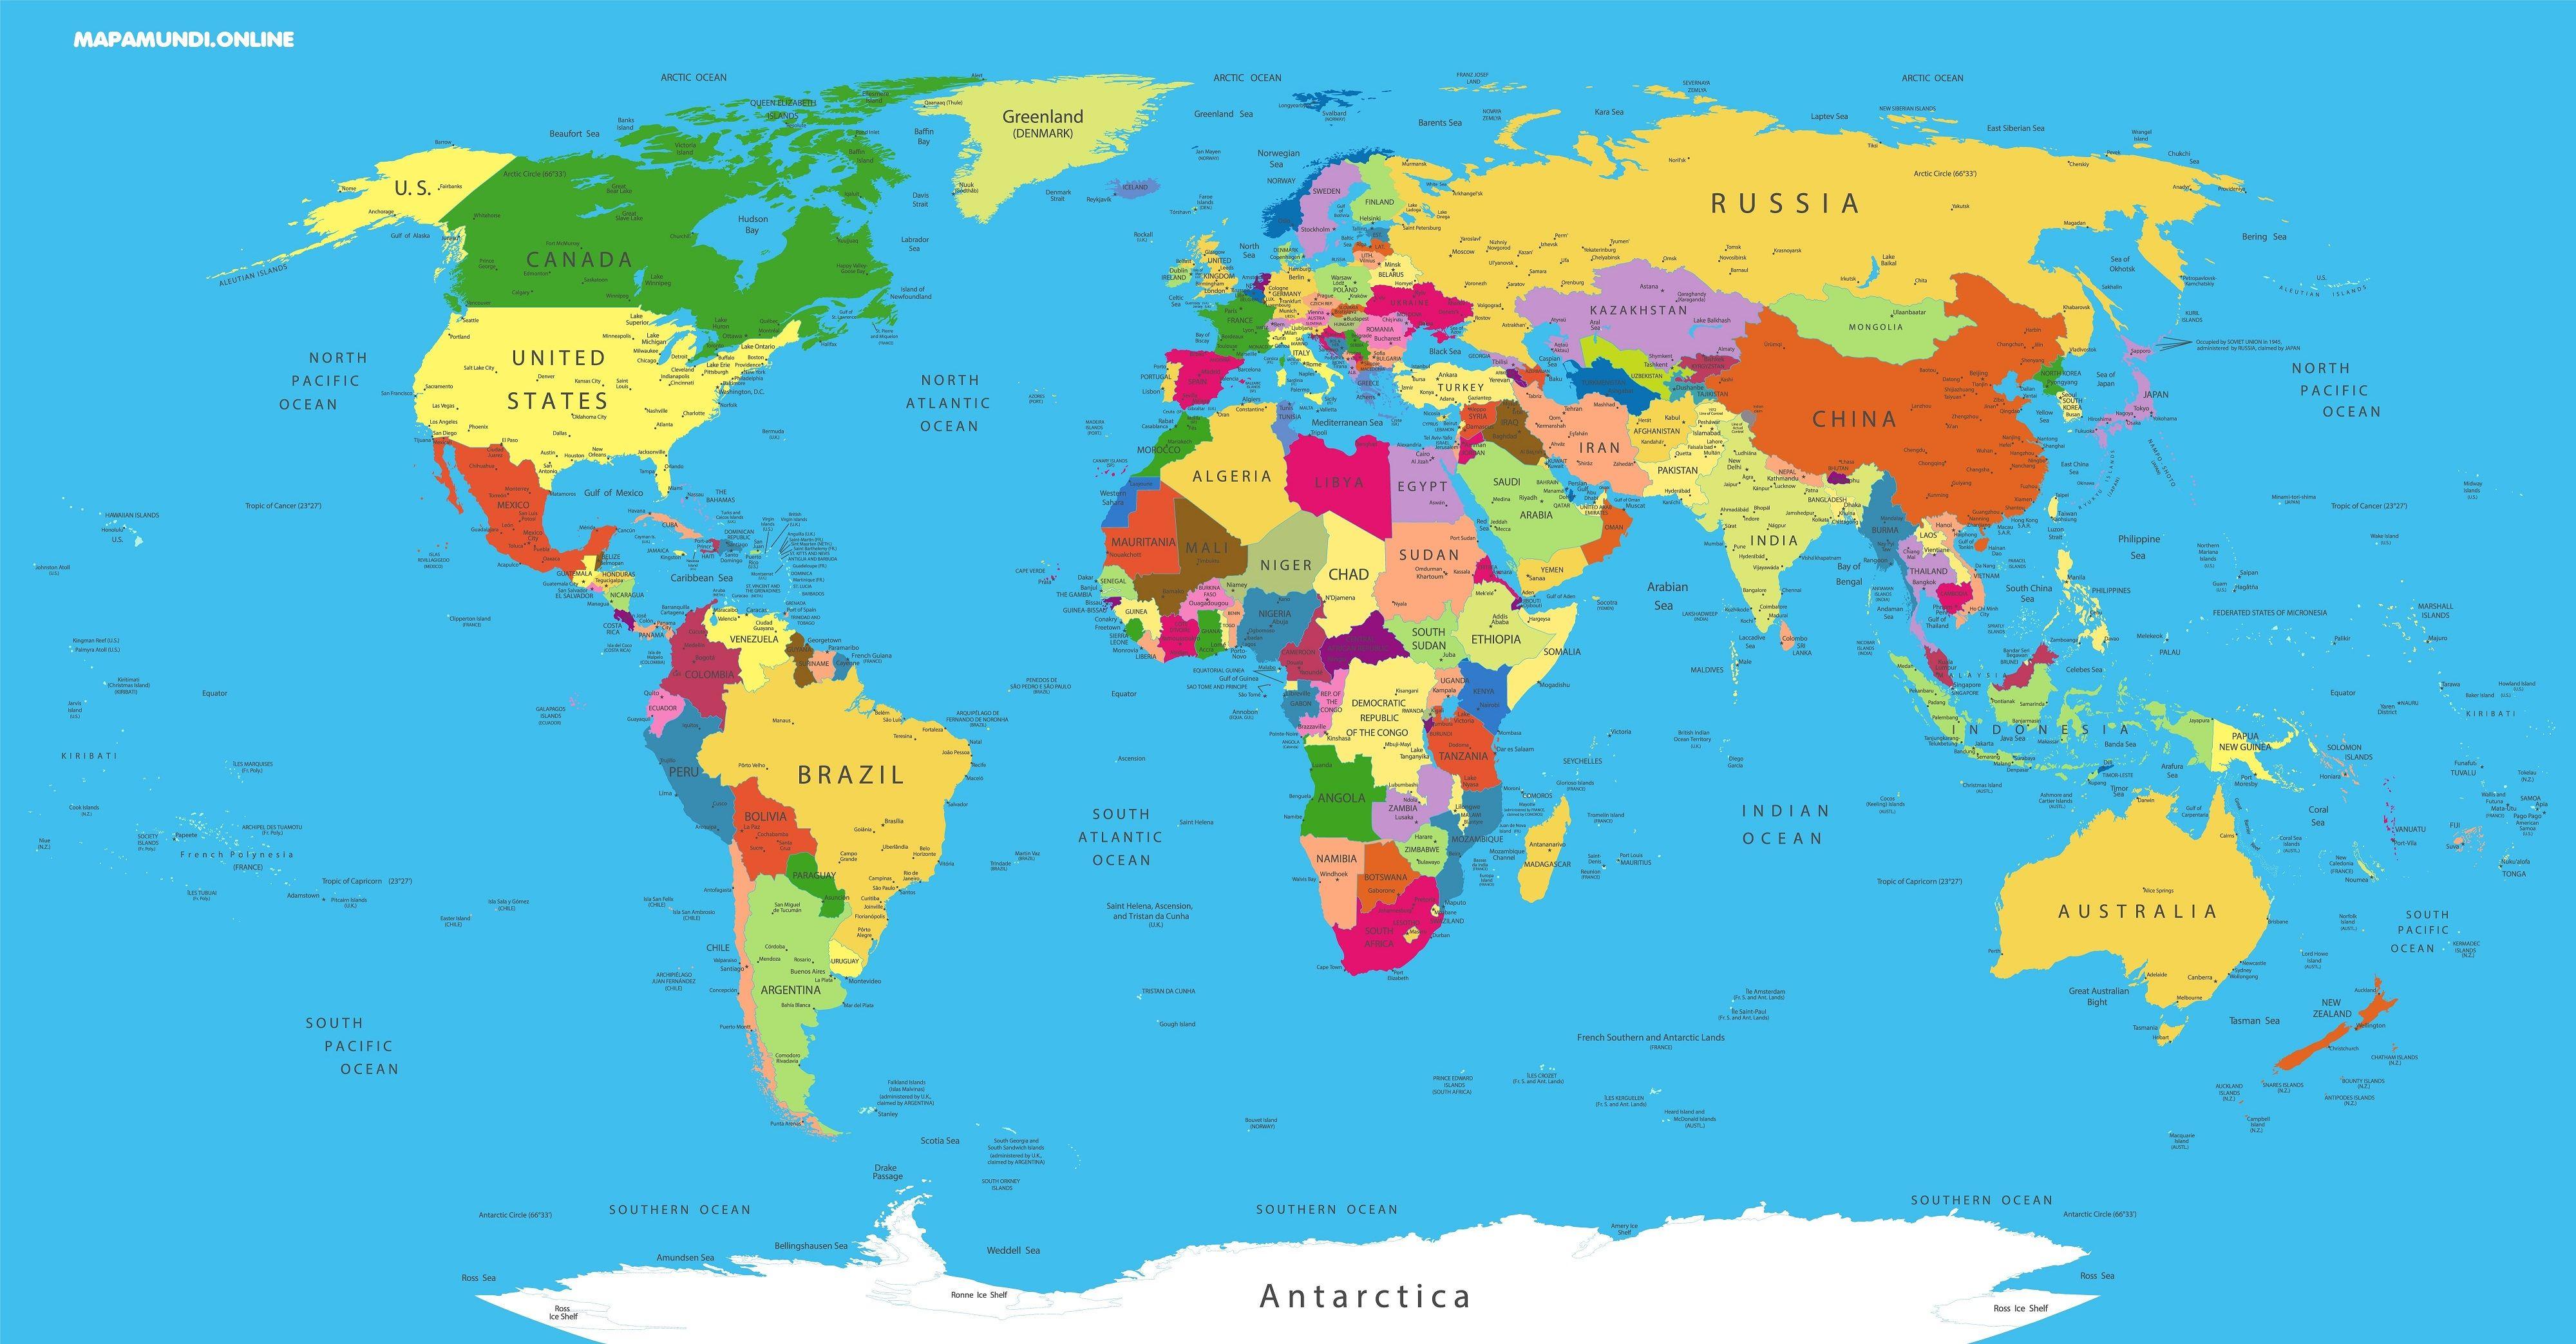 Mapa Del Mundo Paises Para Imprimir.Mapas Del Mundo 2019 Mas De 200 Imagenes Para Imprimir